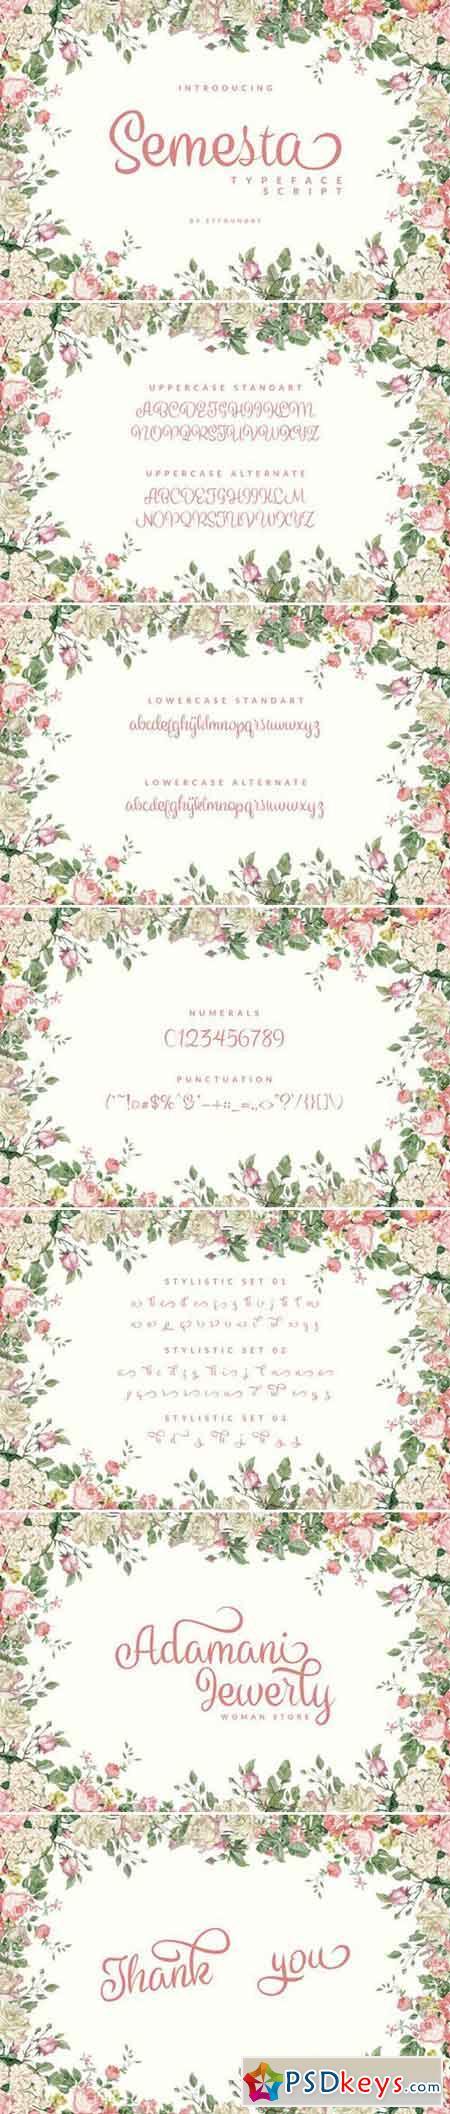 Semesta Typeface Script 977736